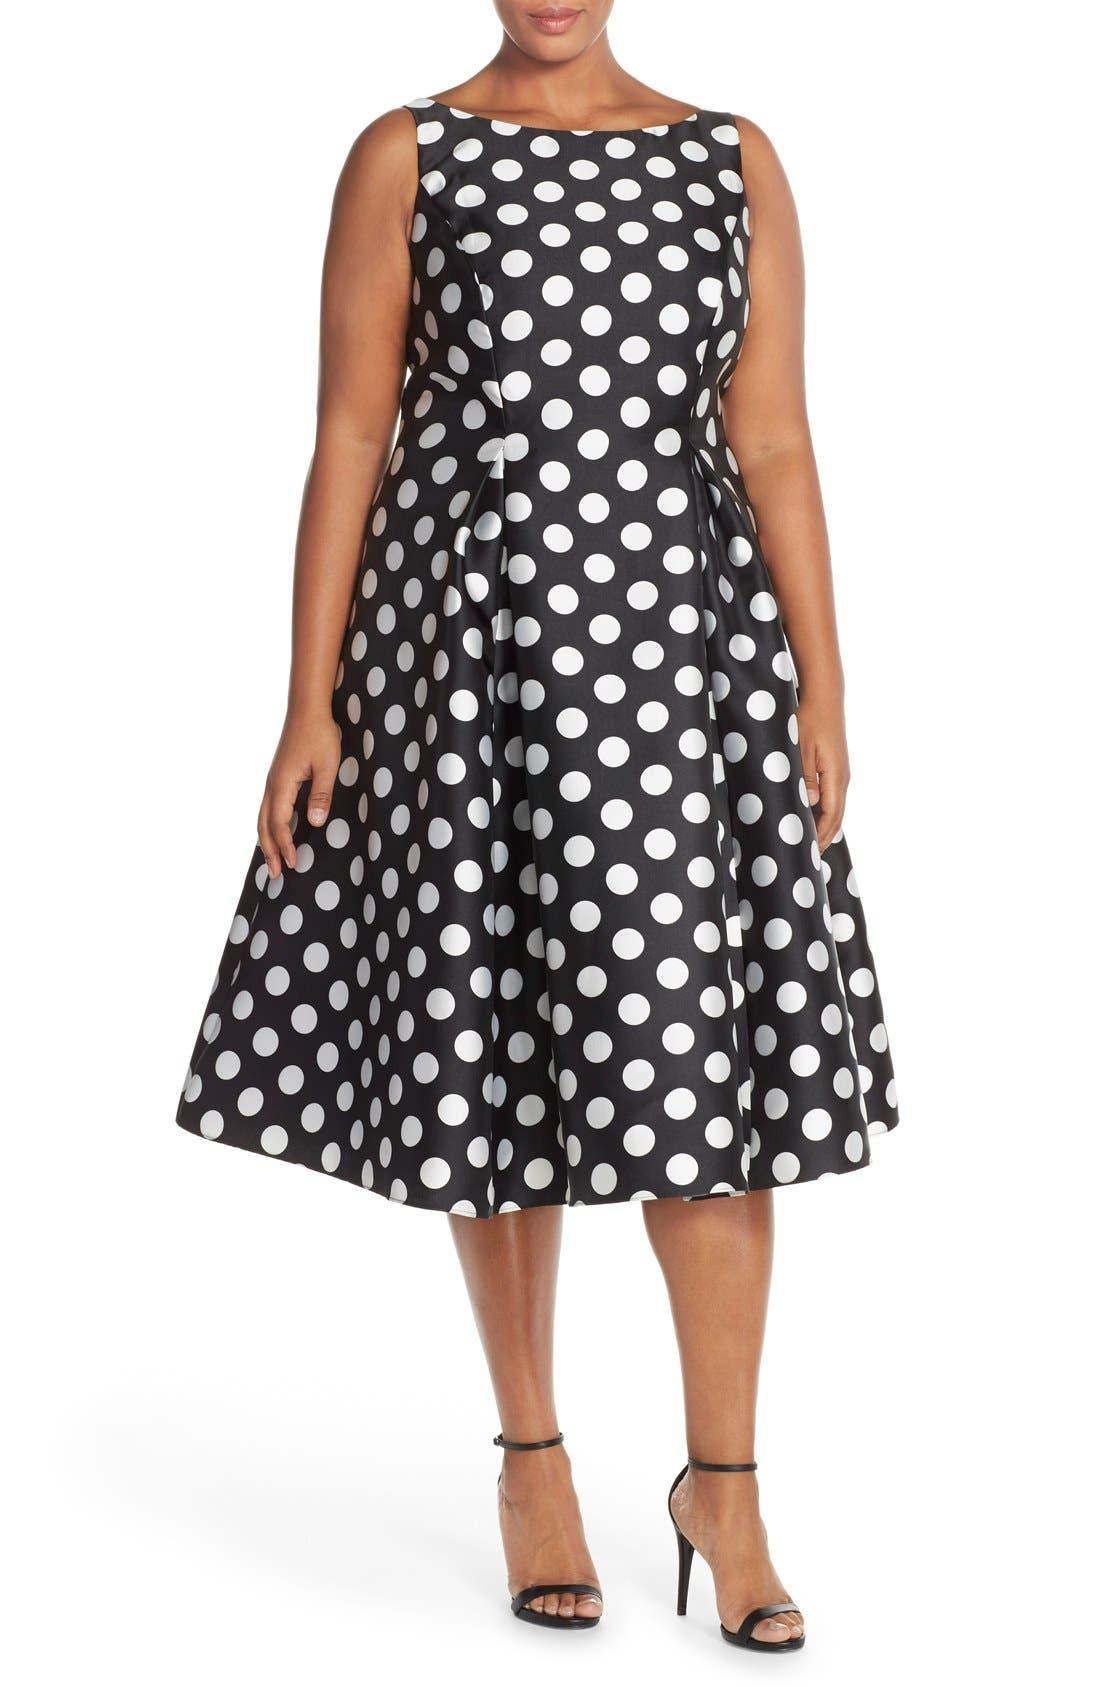 Adrianna Papell Sleeveless Mikado Fit & Flare Polka Dot Midi Dress (Plus Size)